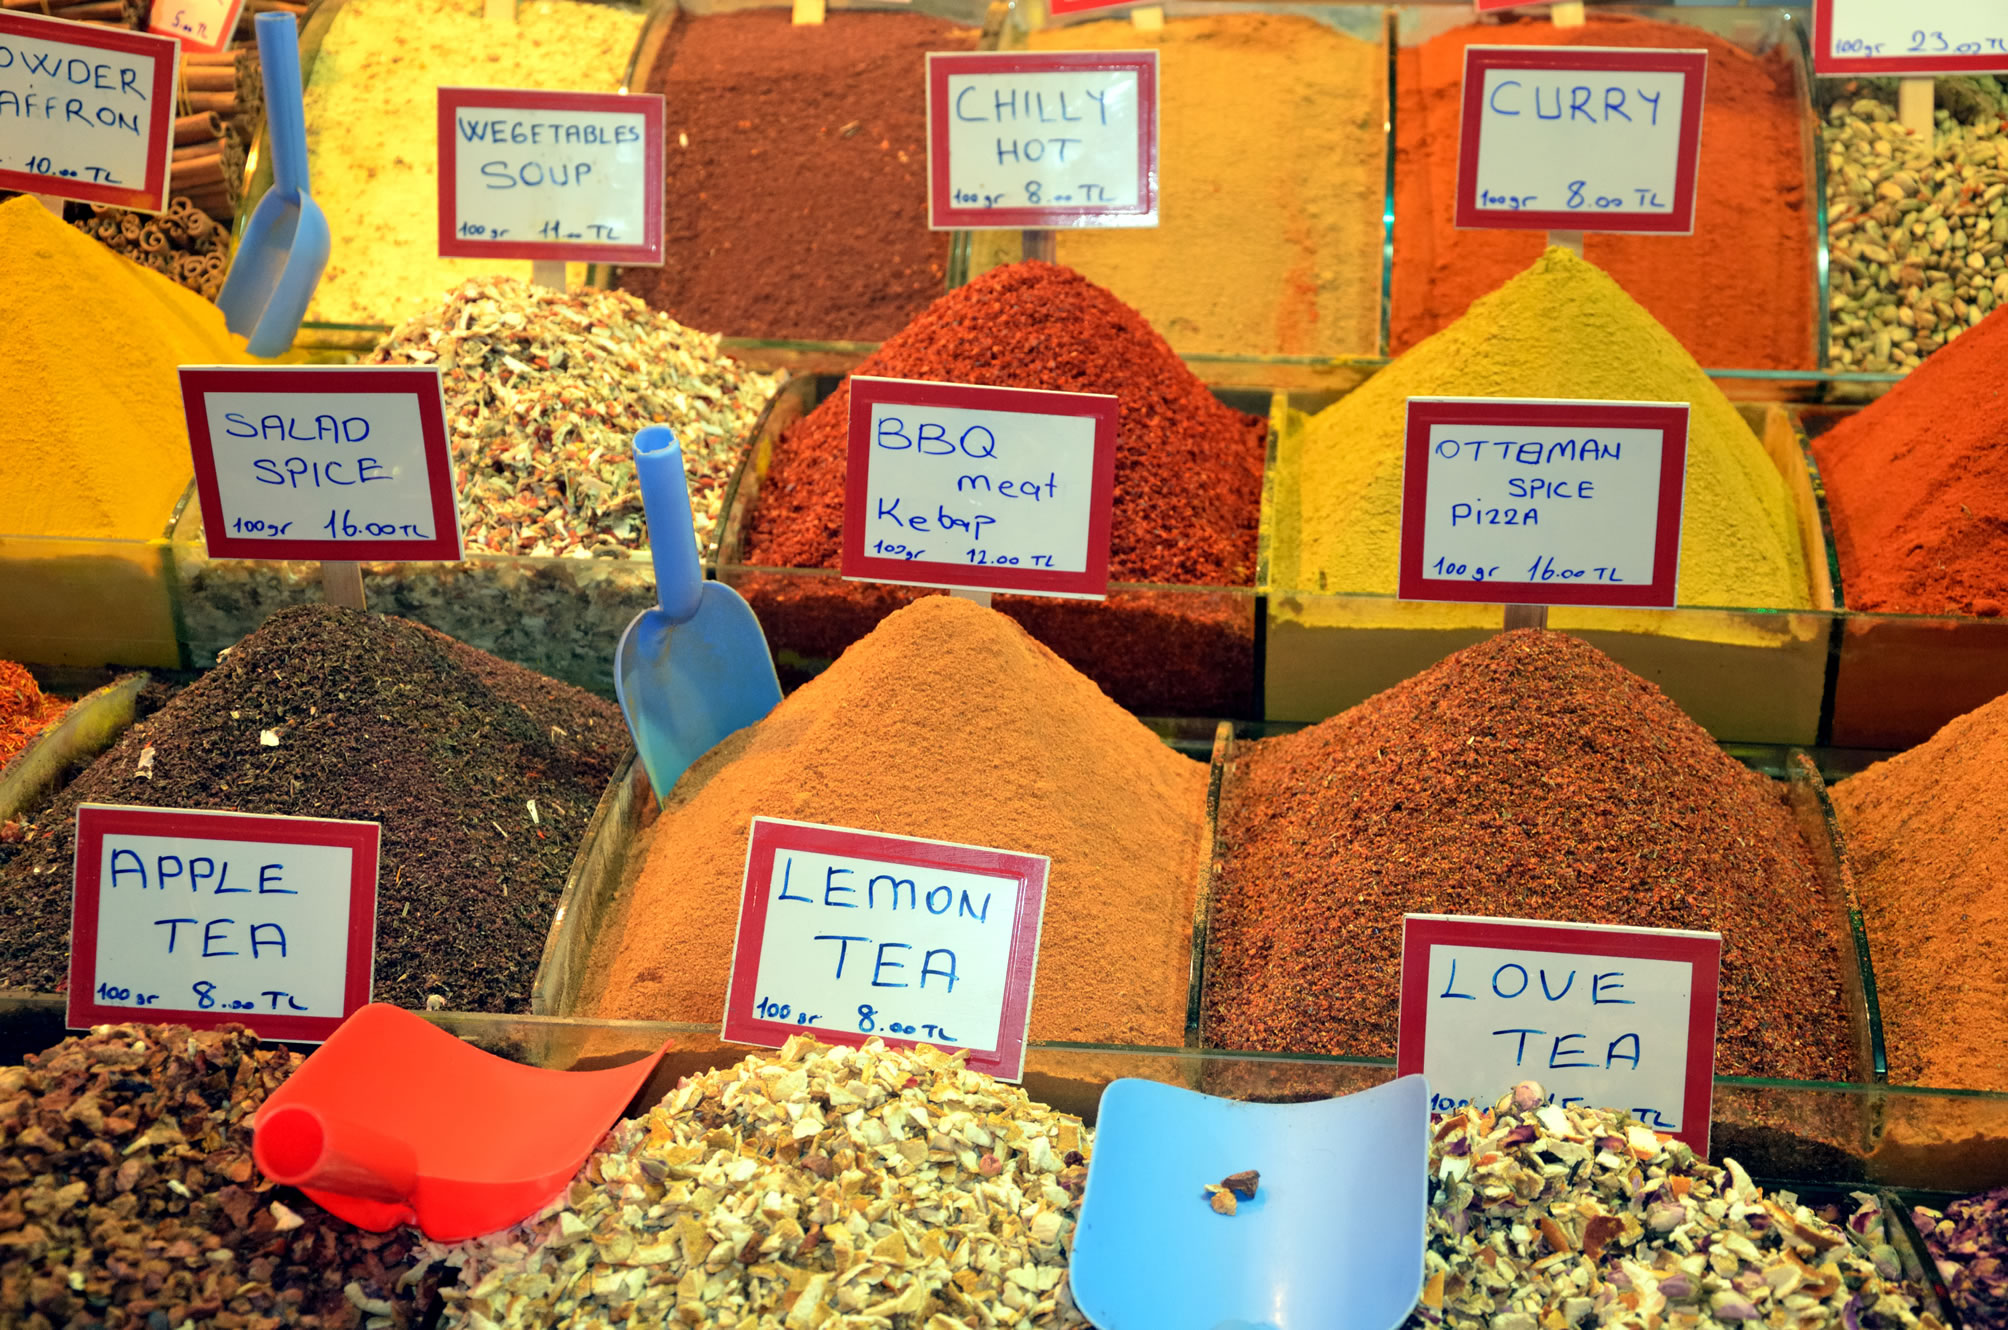 специи сувениры из Турции Стамбул Египетский рынок